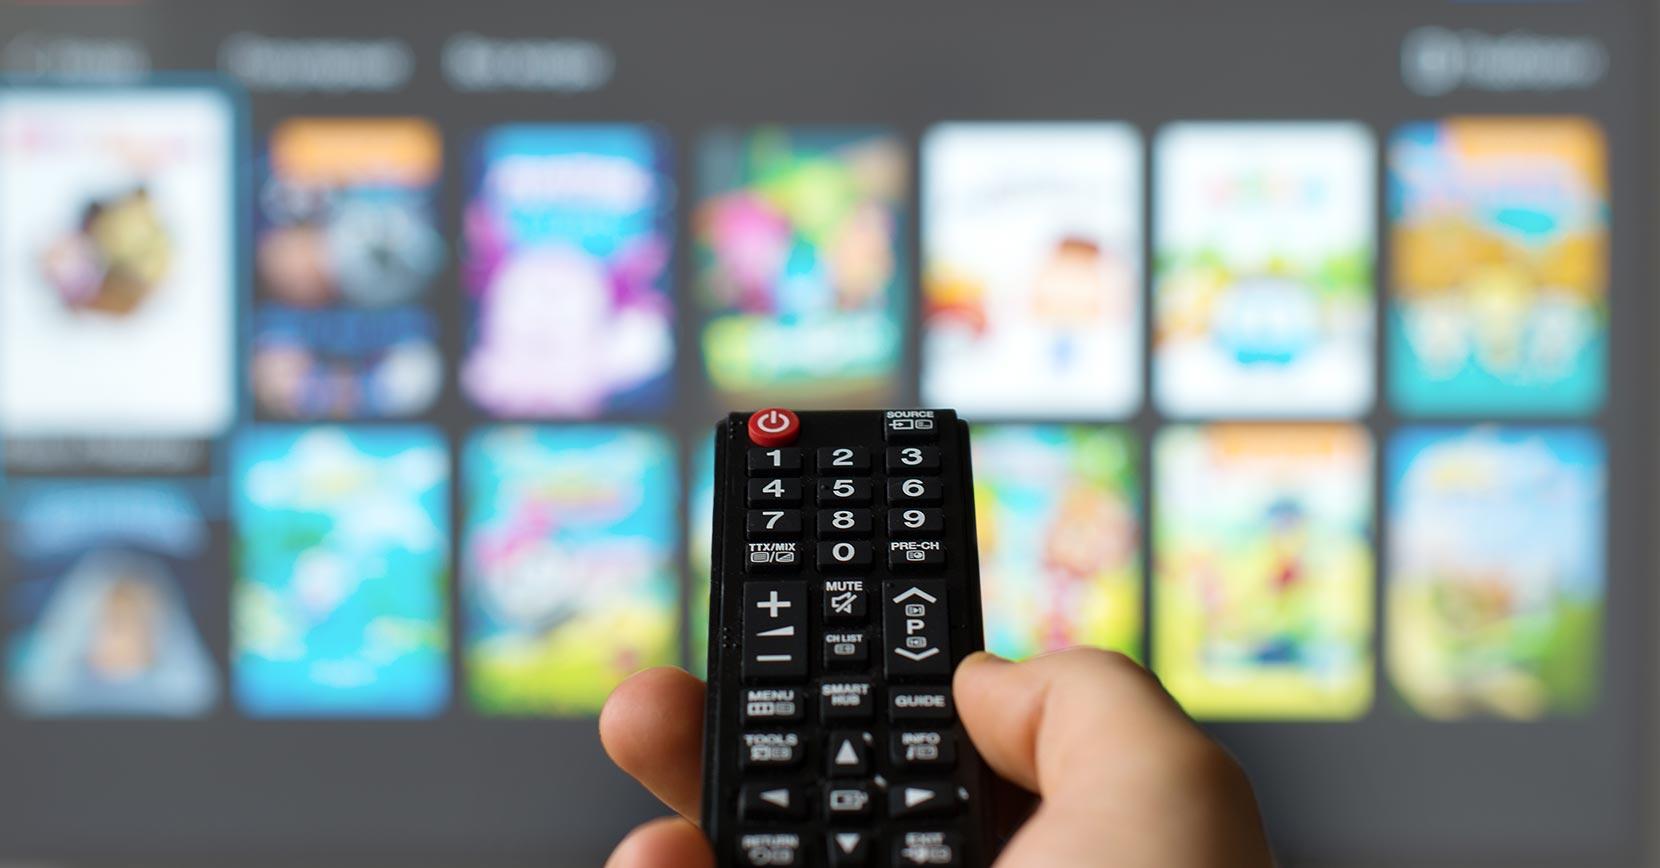 compras na tv